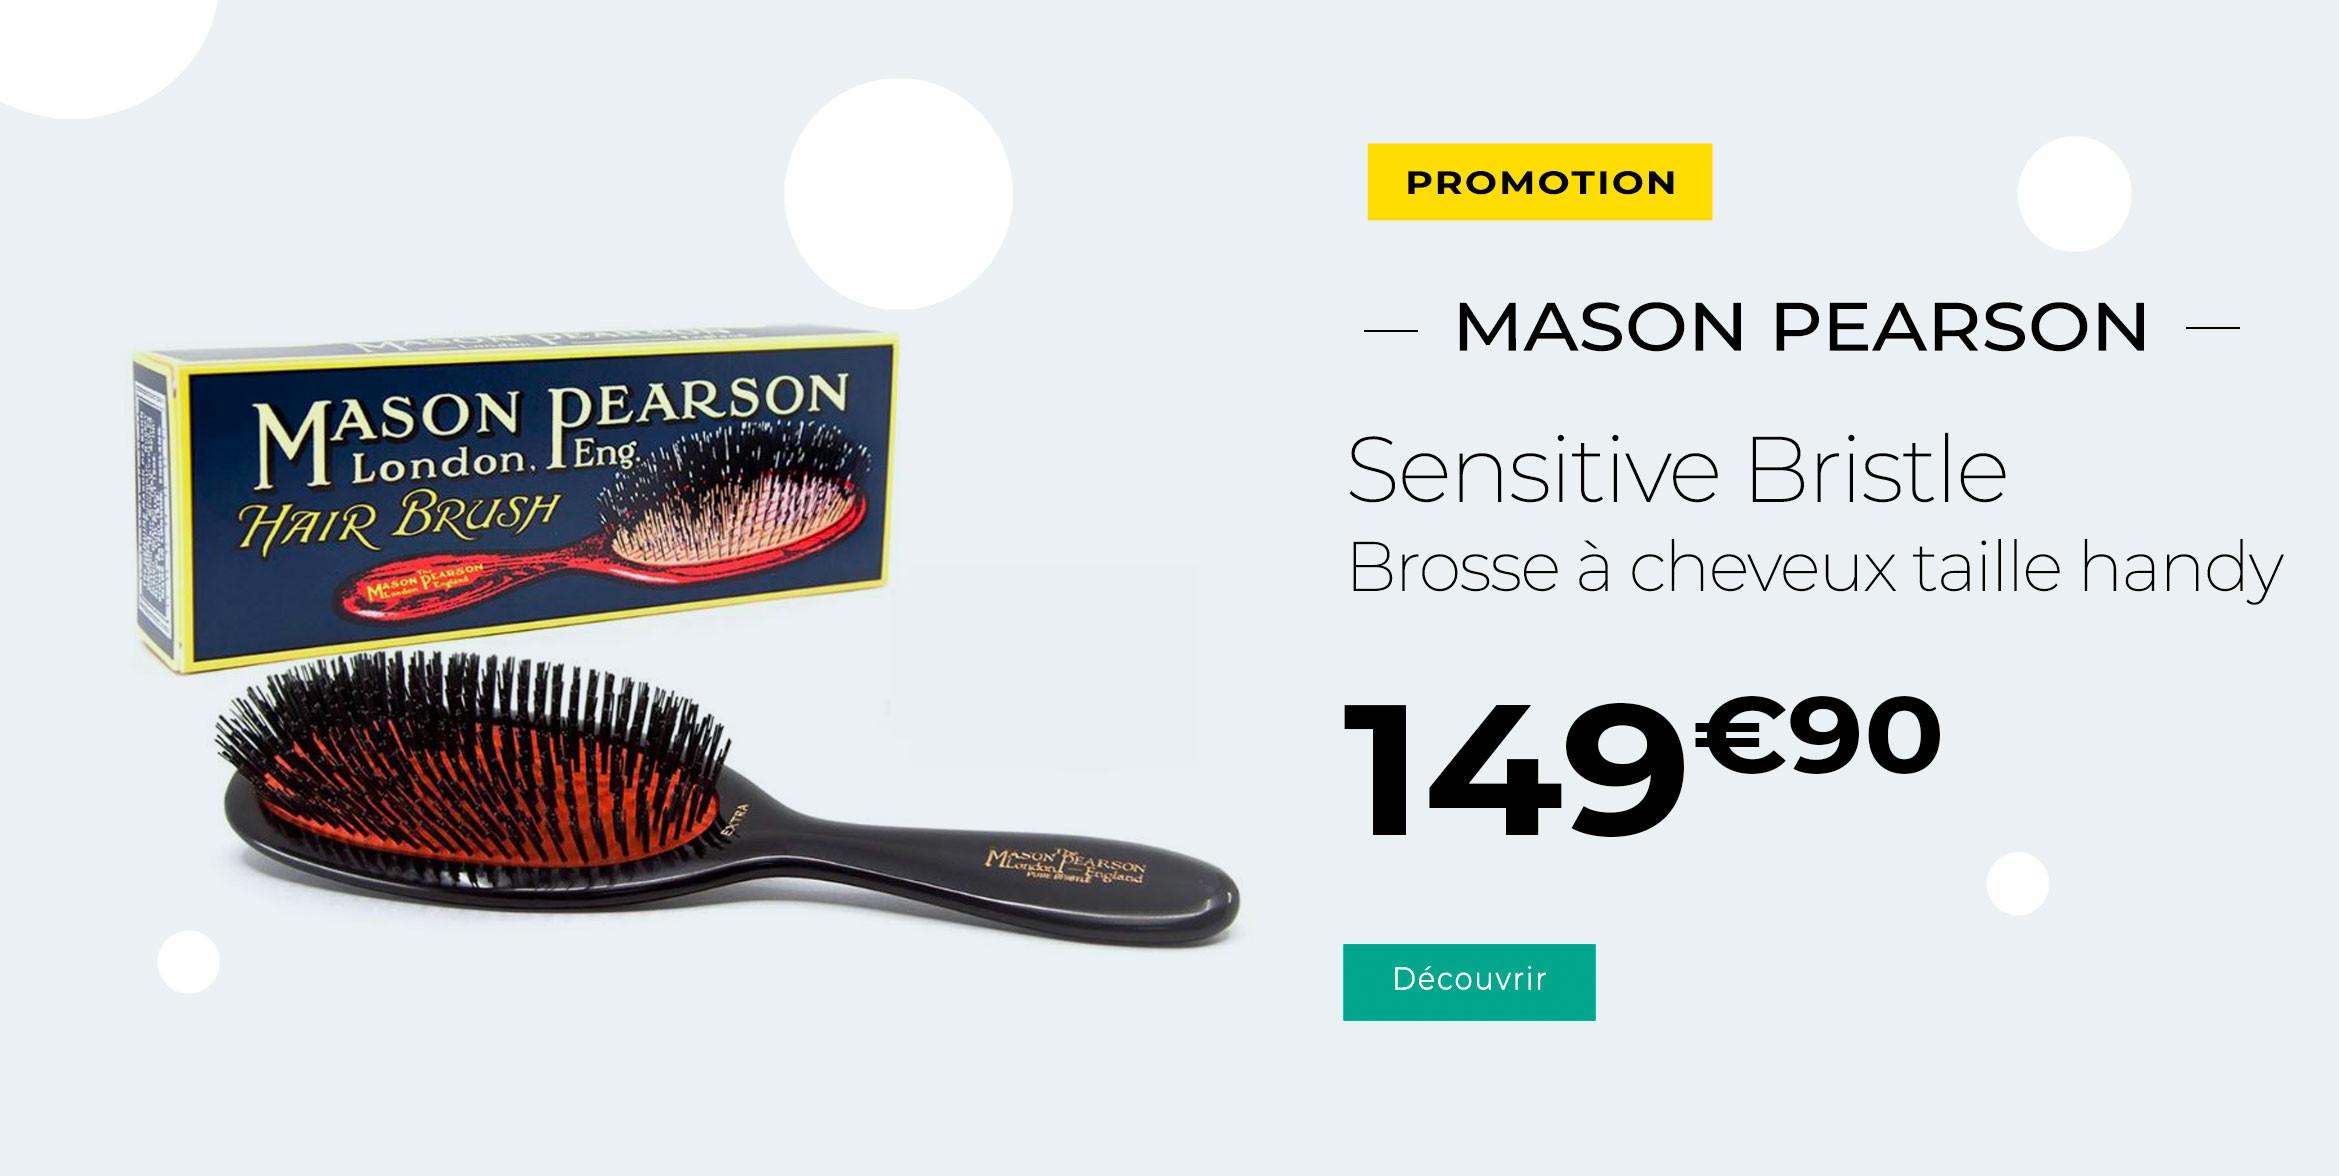 Mason Pearson Sensitive Bristle Brosse A Cheveux Noir Sb3 Taille Handy